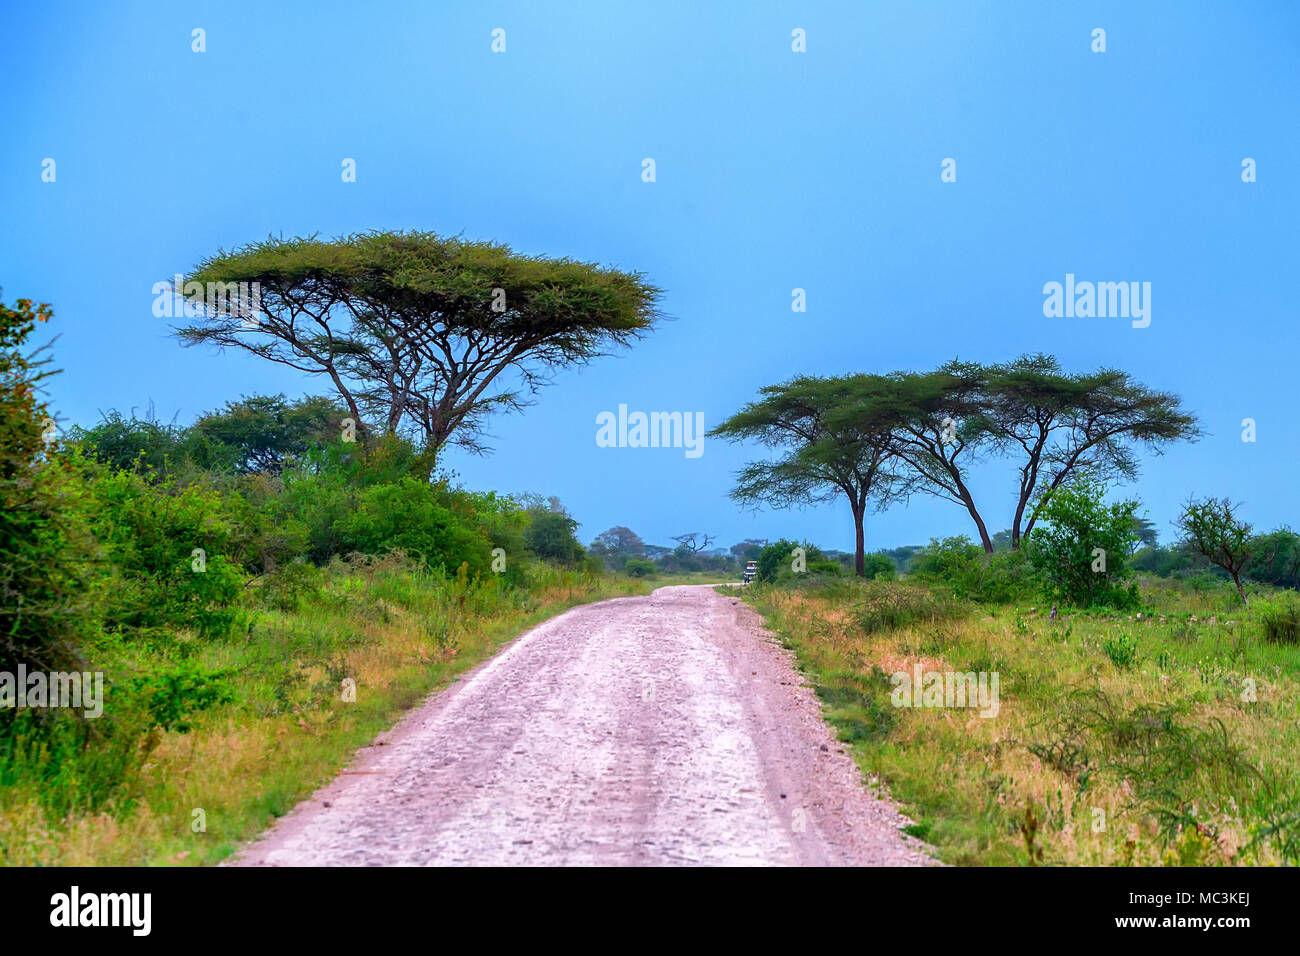 Carretera Escénica en África bosque Imagen De Stock